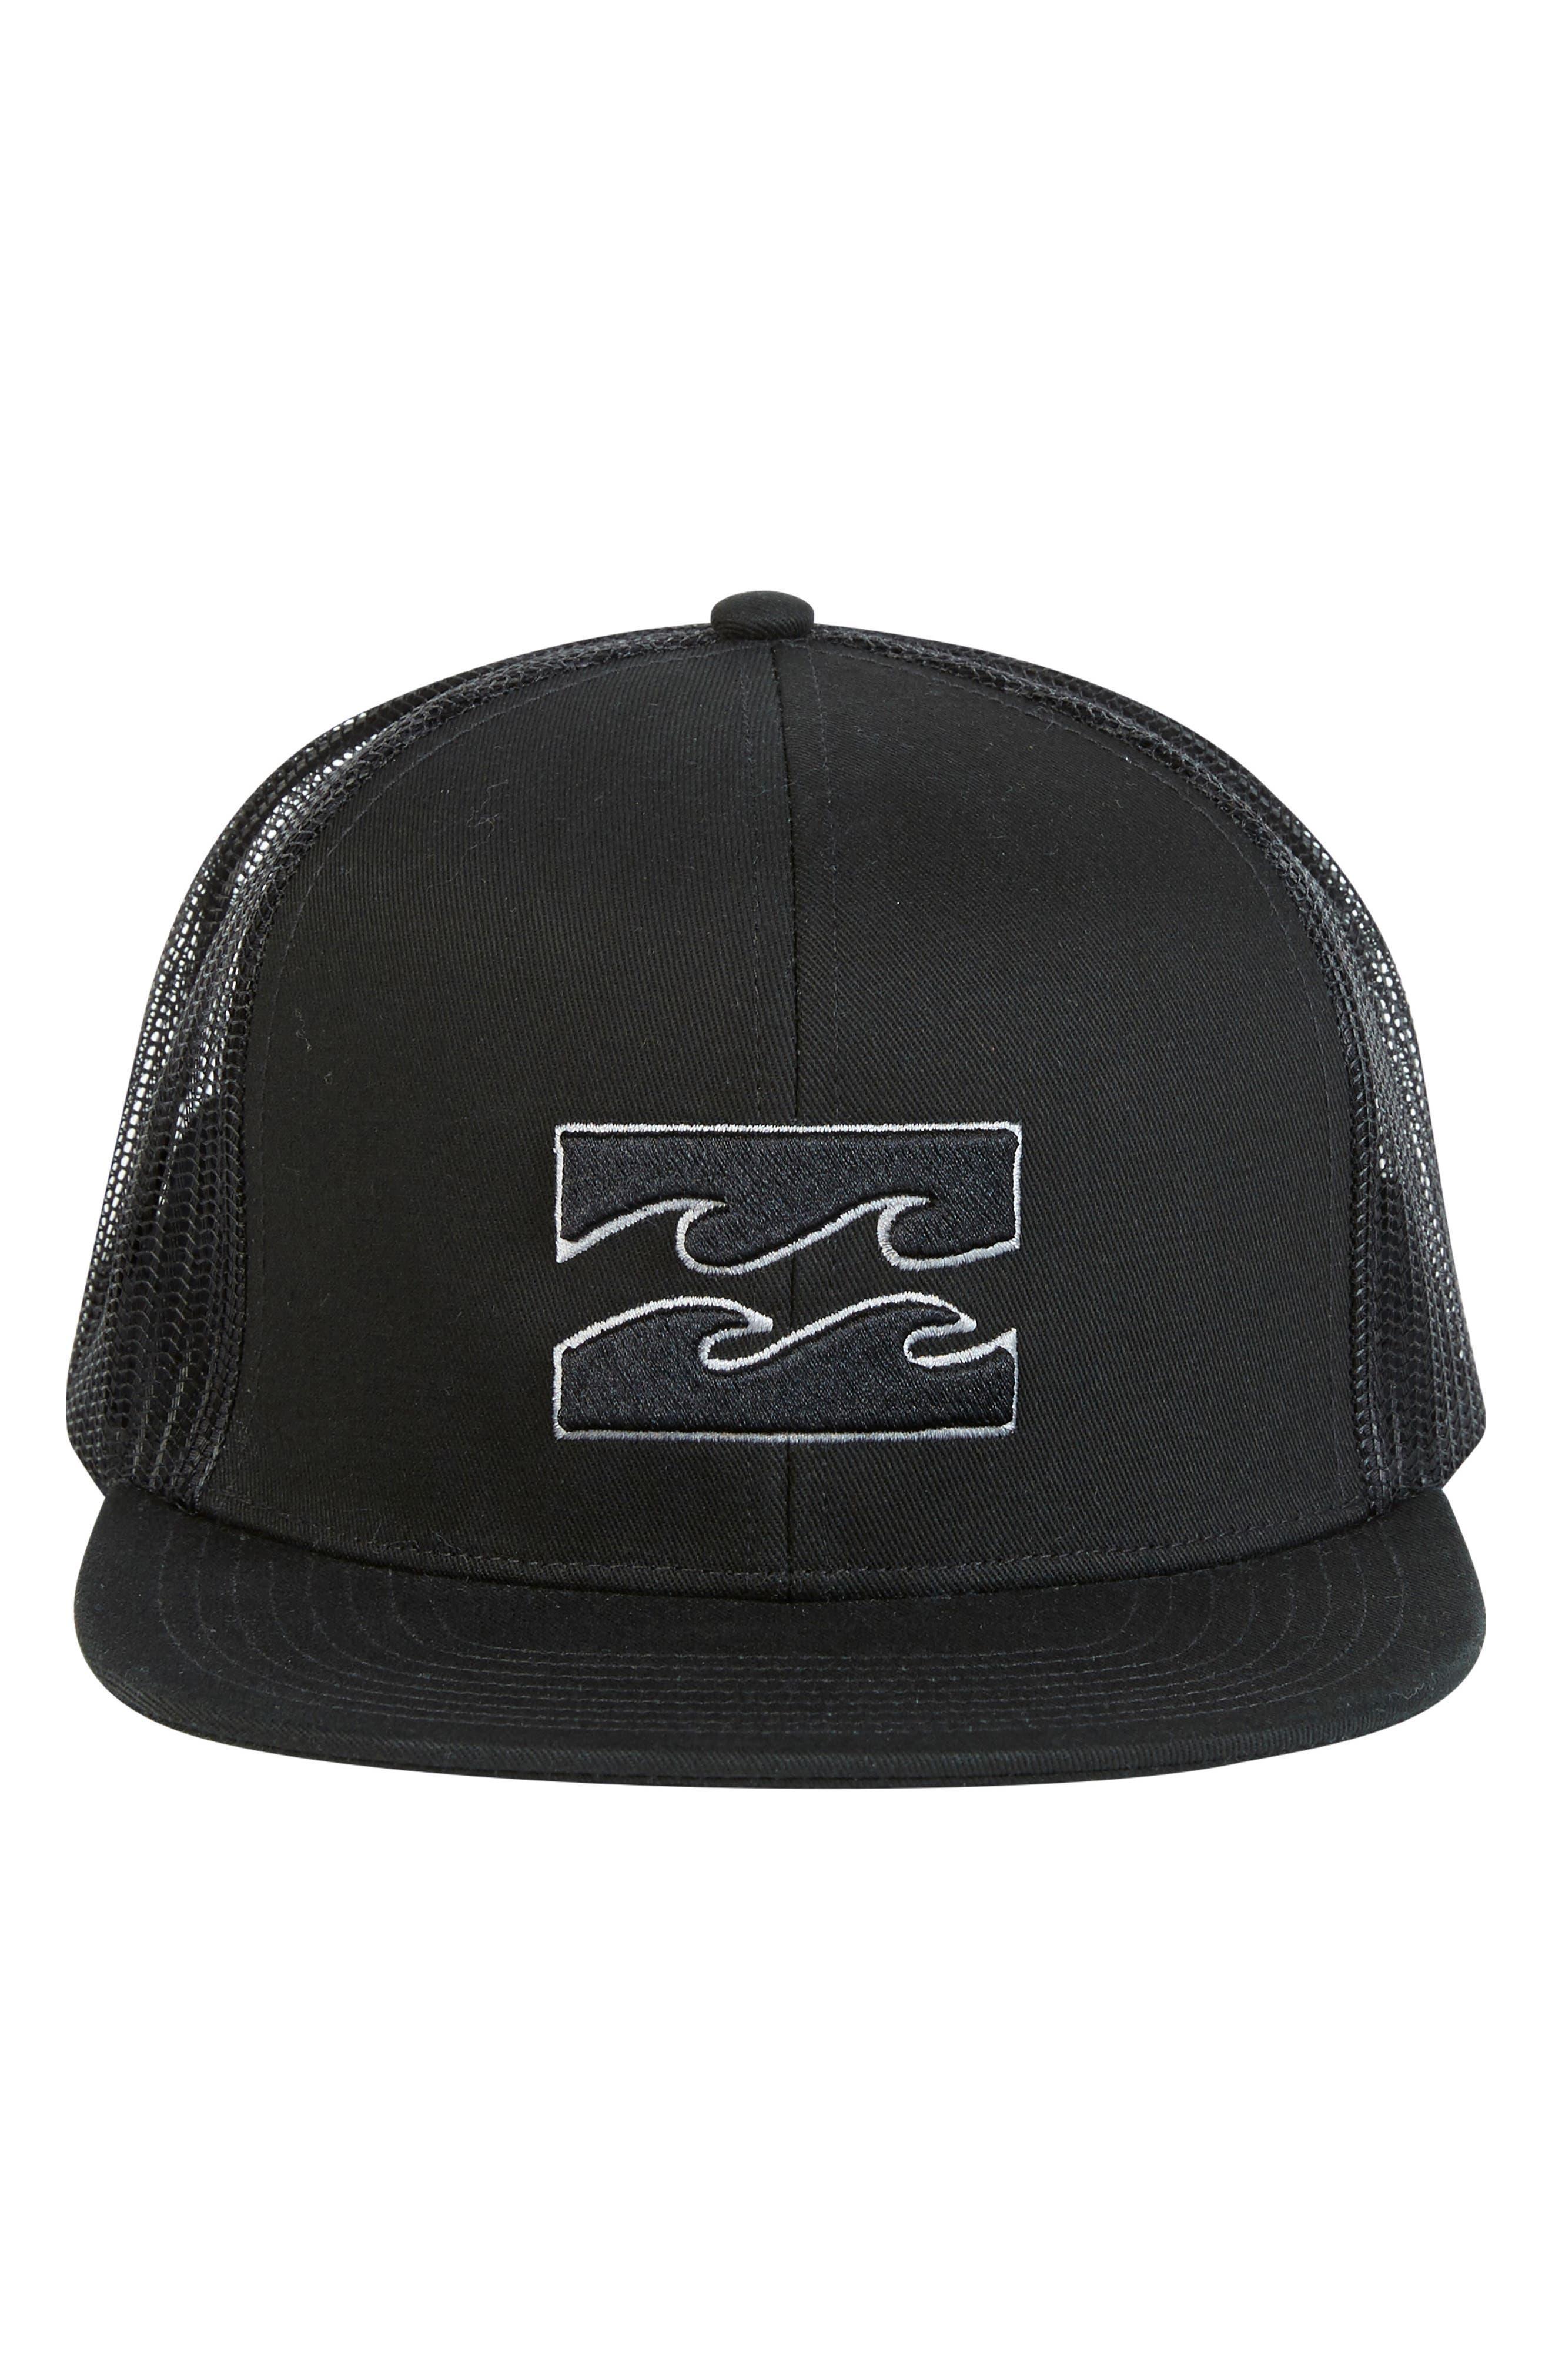 All Day Trucker Hat,                             Alternate thumbnail 2, color,                             027